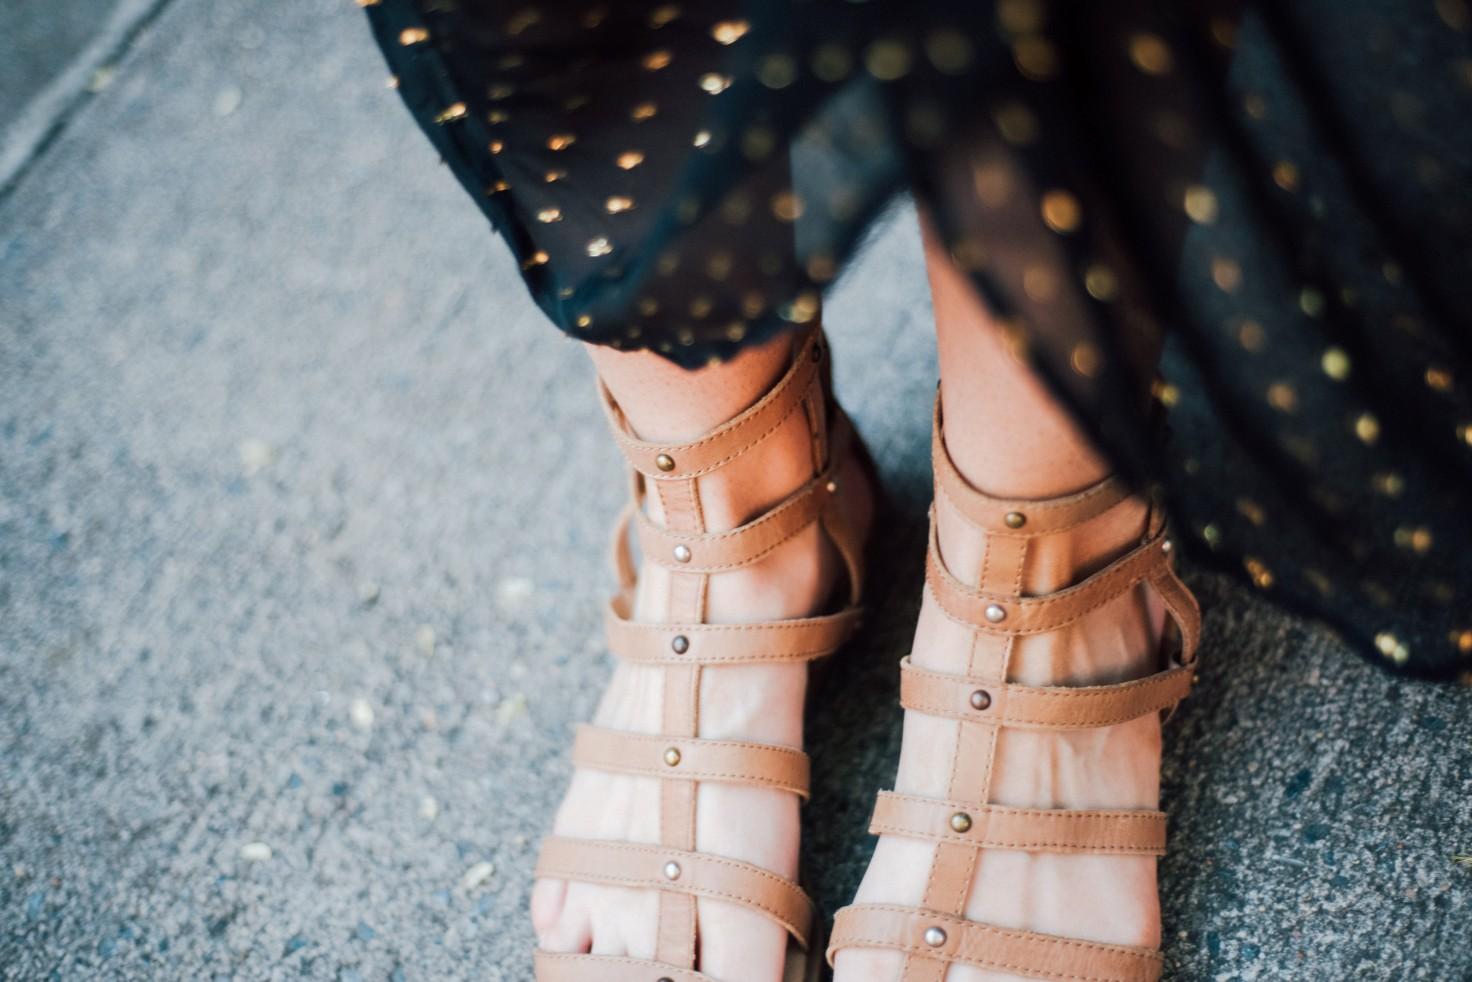 black gold metallic dot maxi dress H&M new york fashion blogger west village lauren slade style elixir blog 5 | Metallic Gold Polka Dot Dress featured by popular US style blogger, Style Elixir